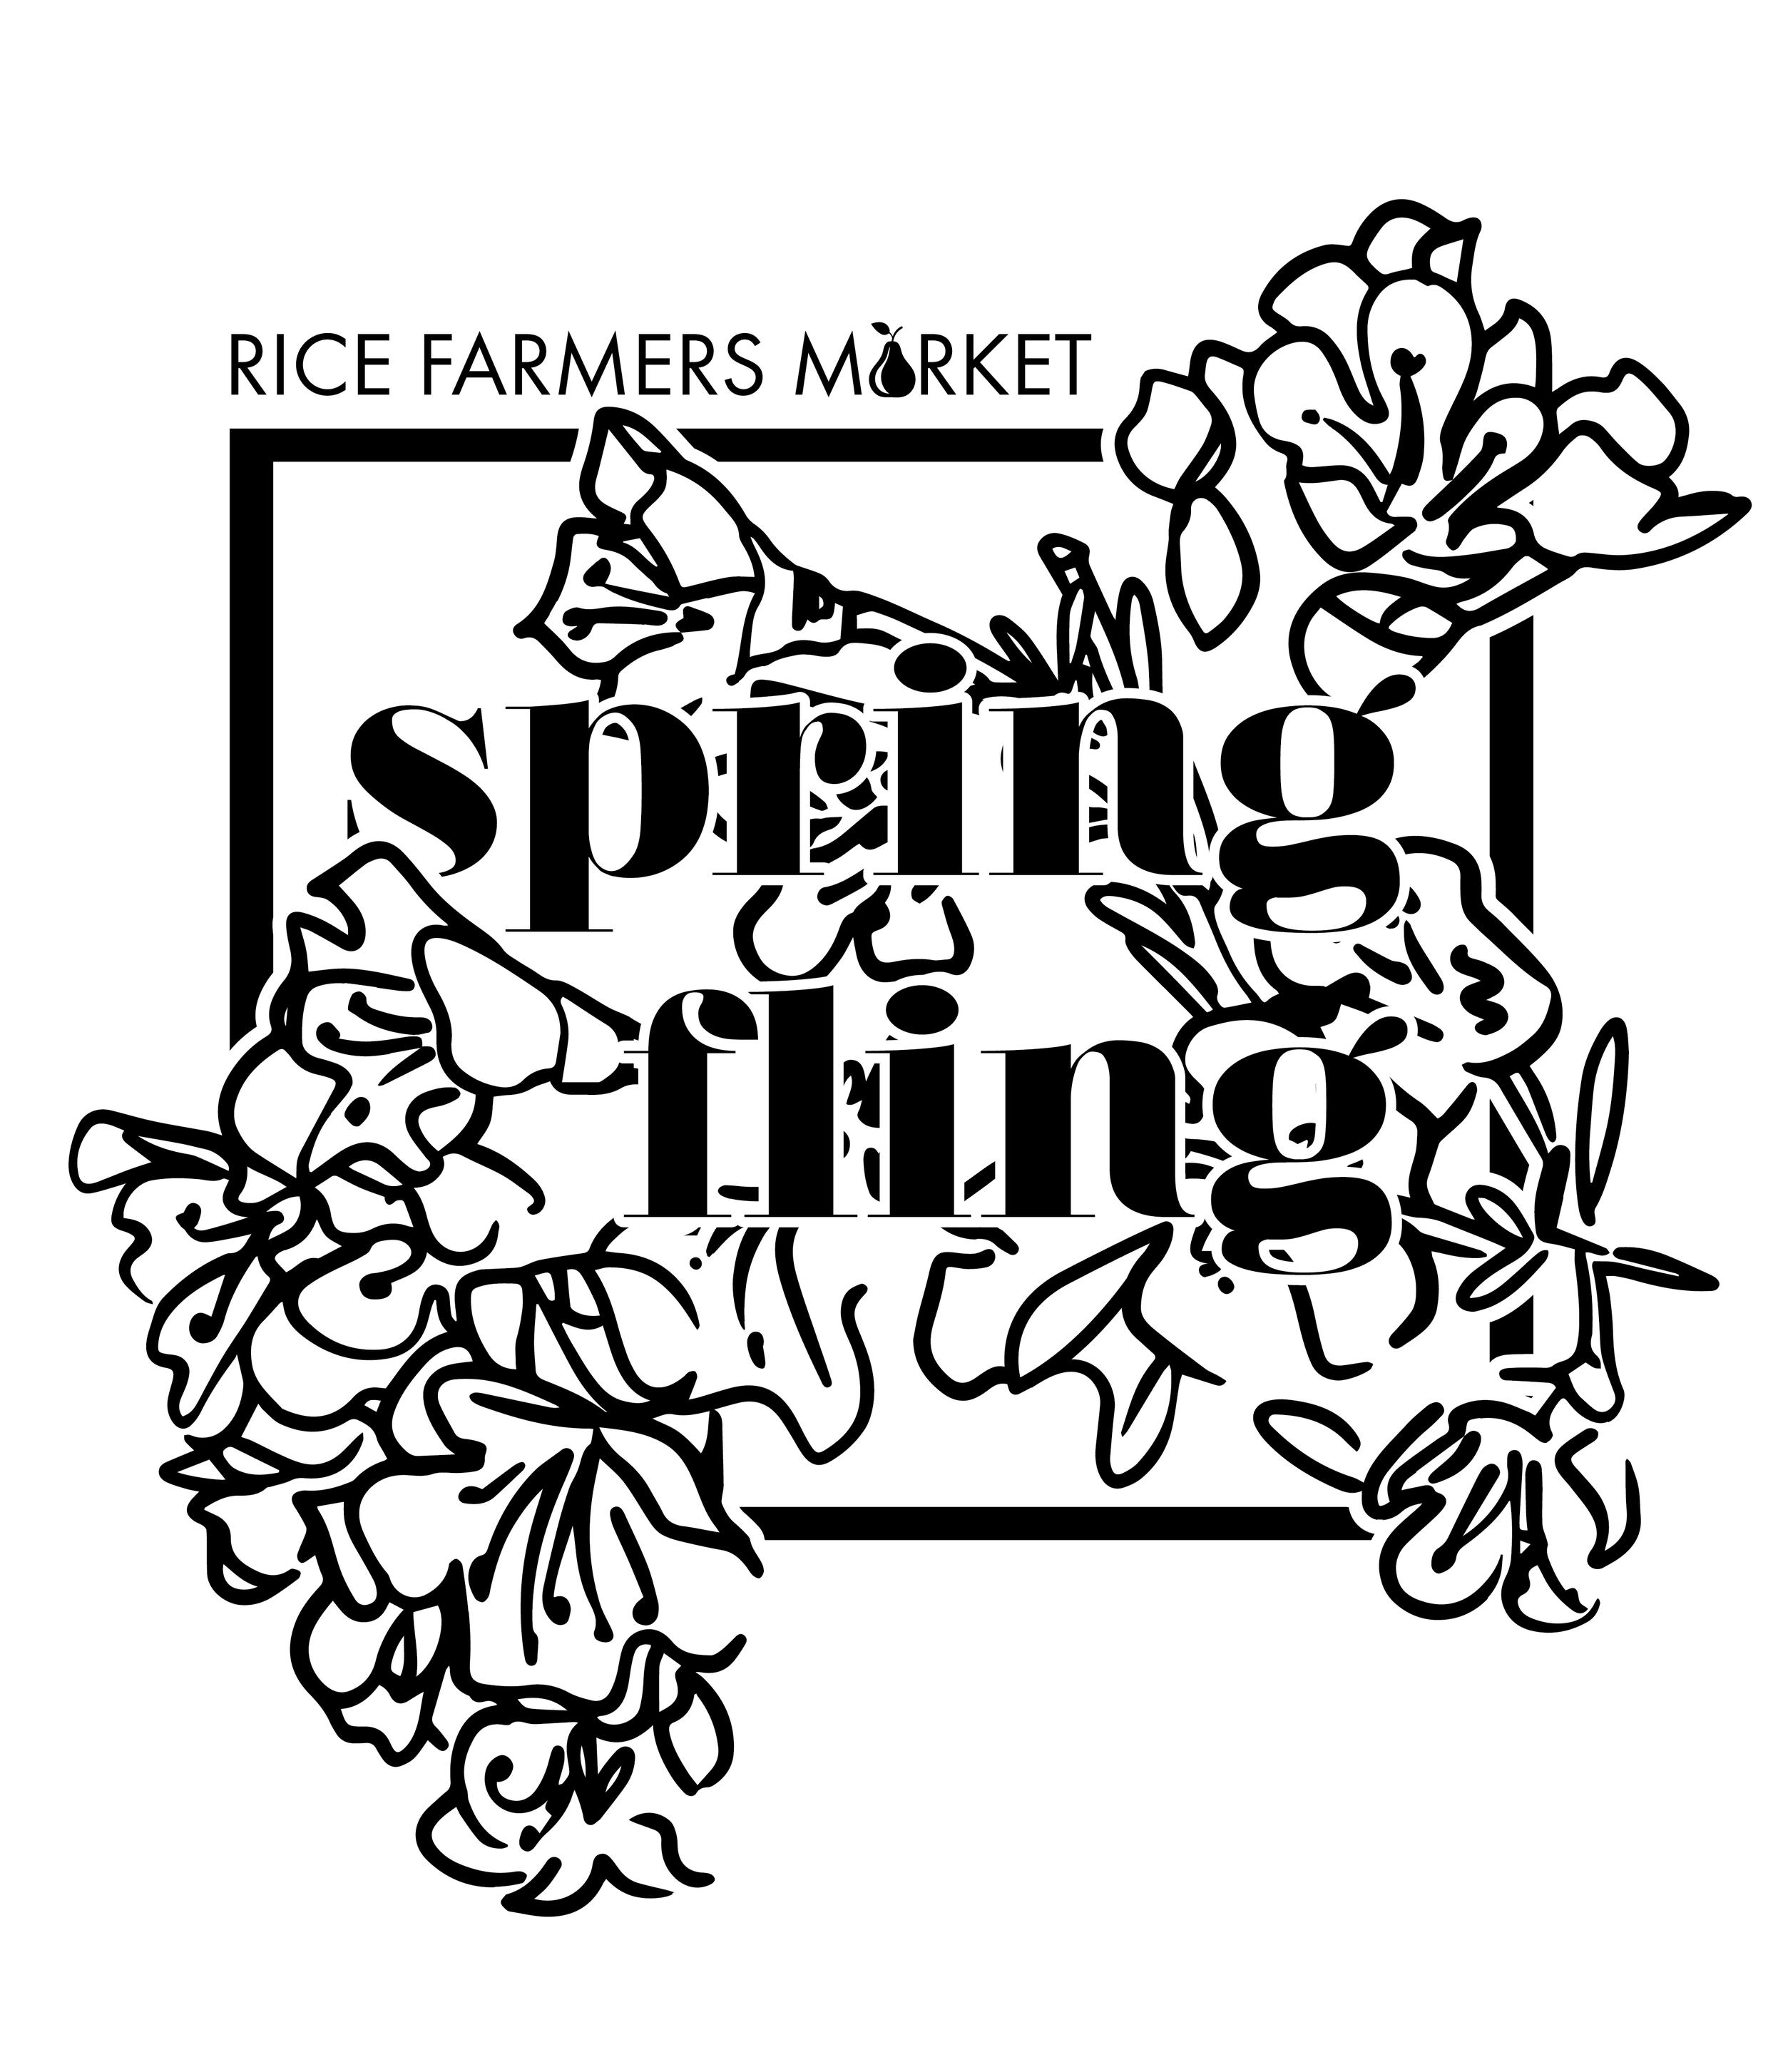 SpringFling-bw-01.png